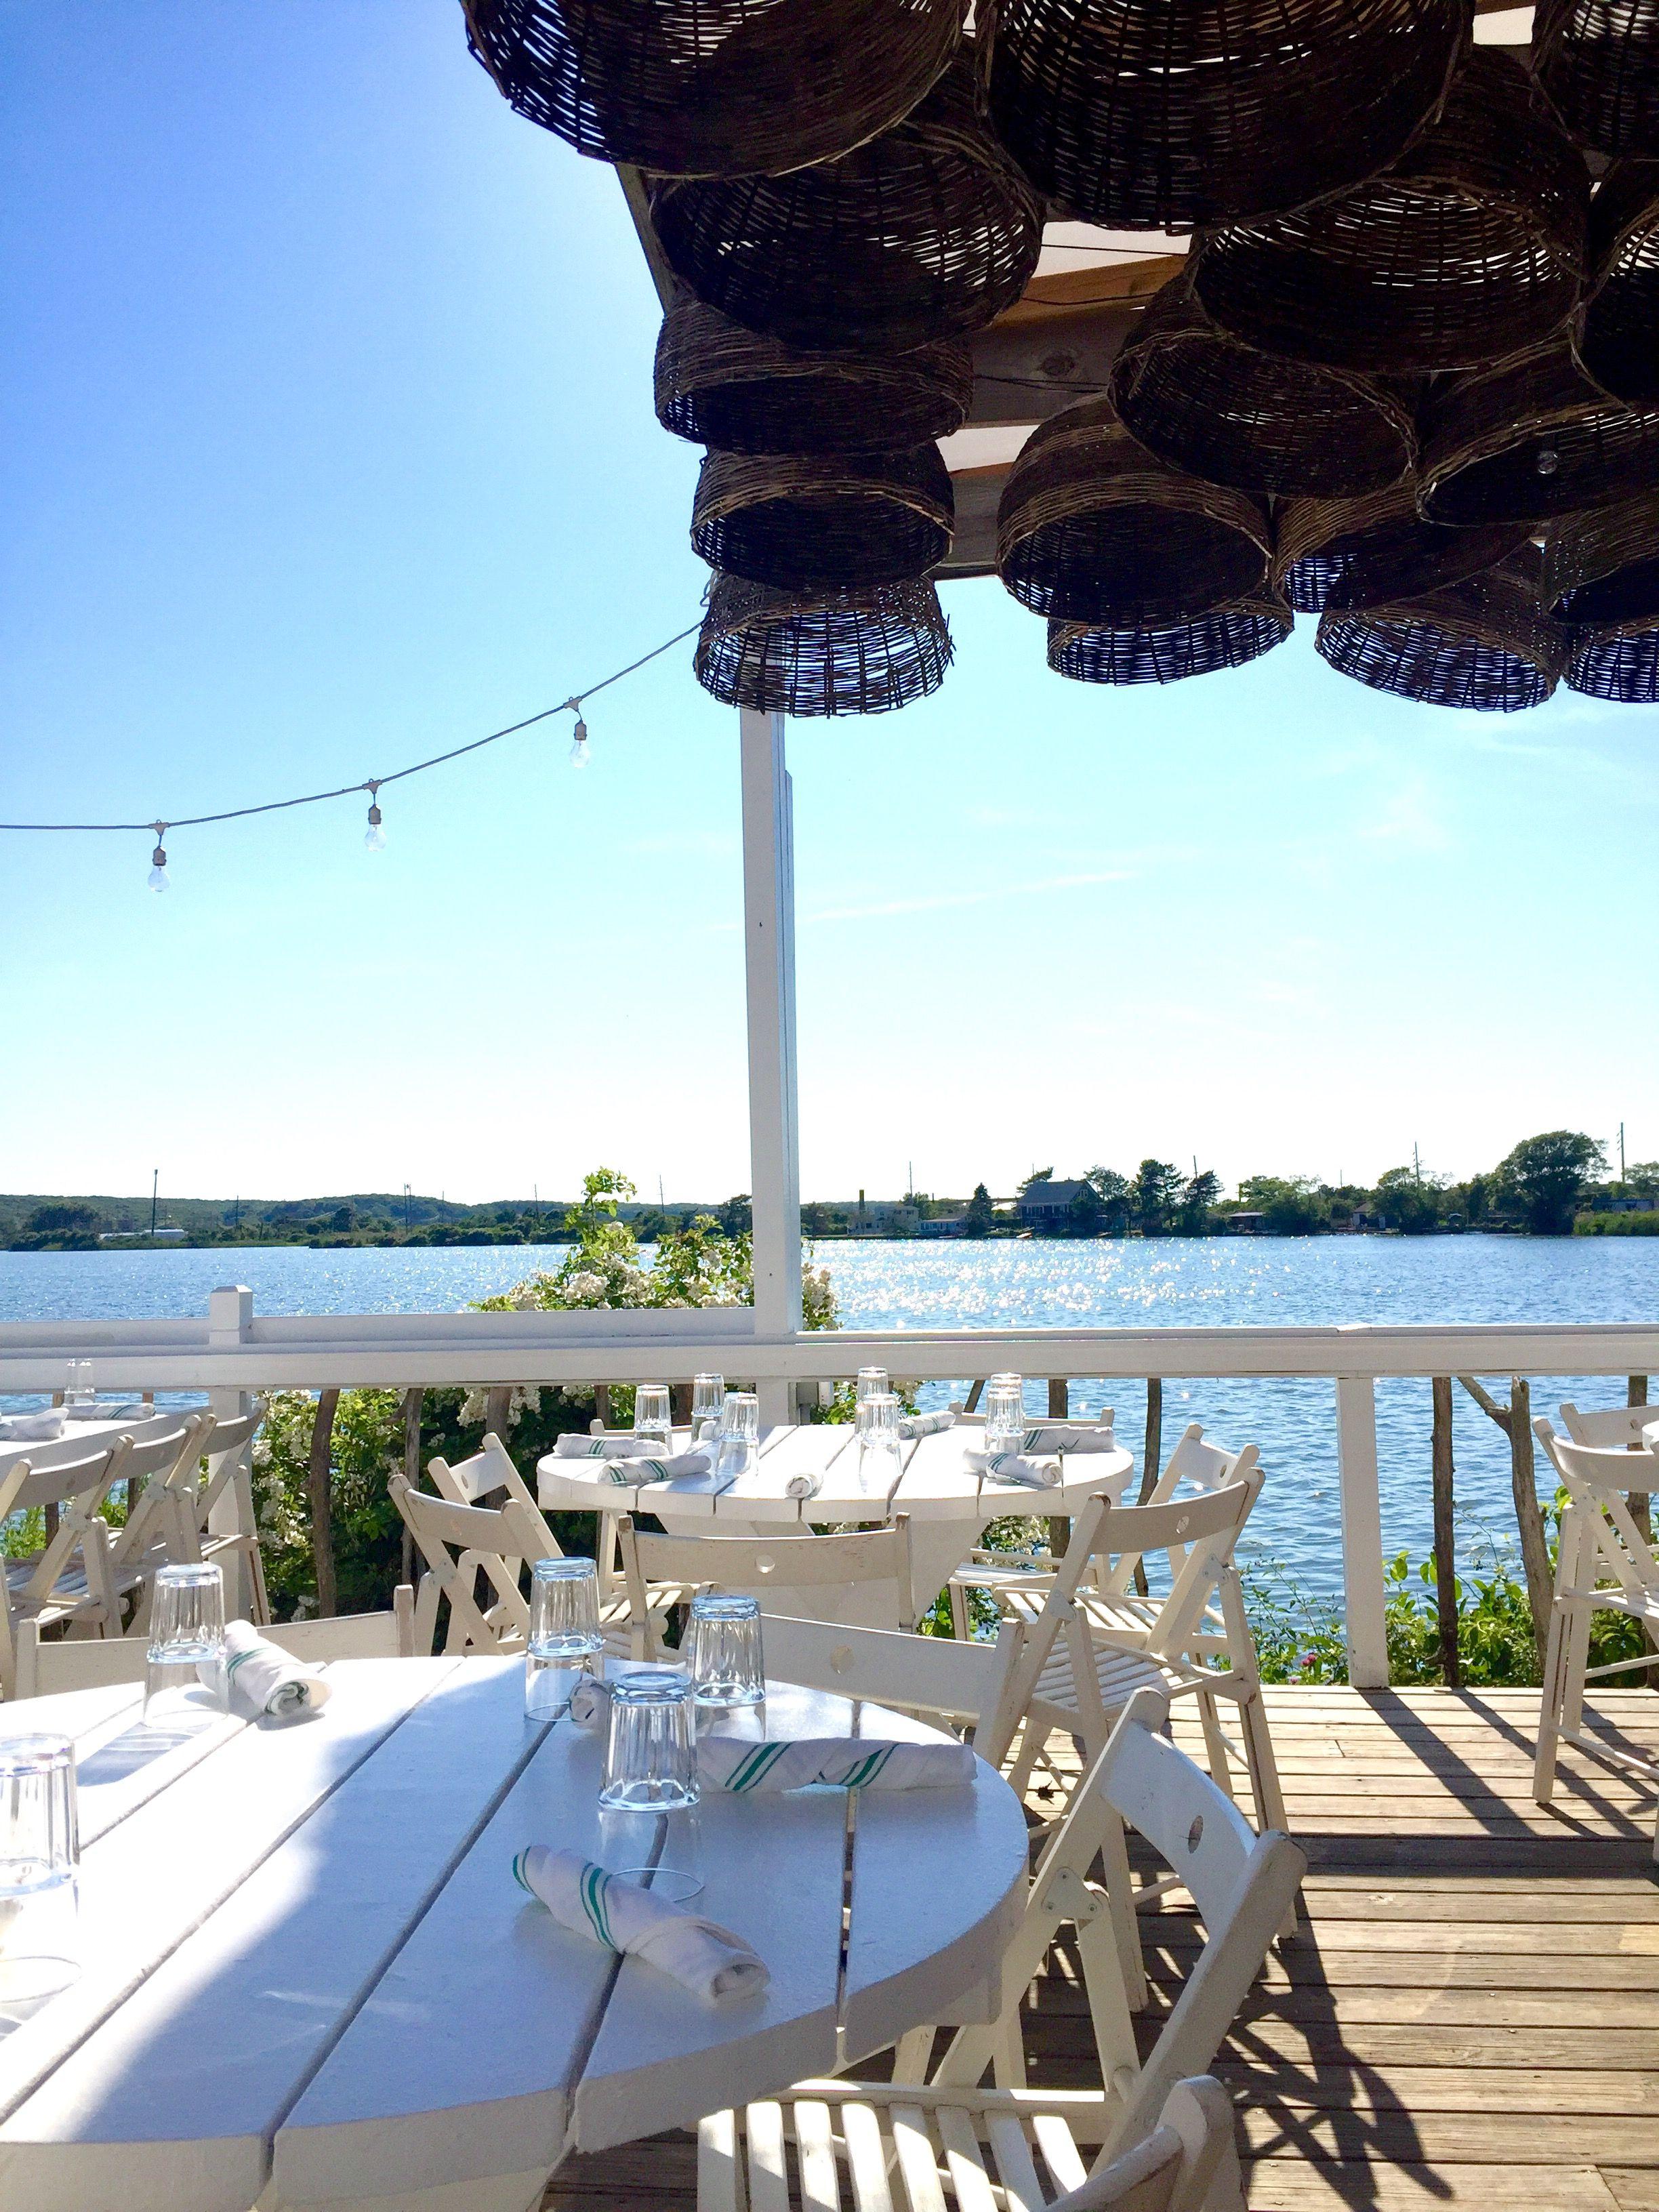 Ruschmeyer\'s Hotel, Kitchen and Bar in Montauk, The Hamptons ...